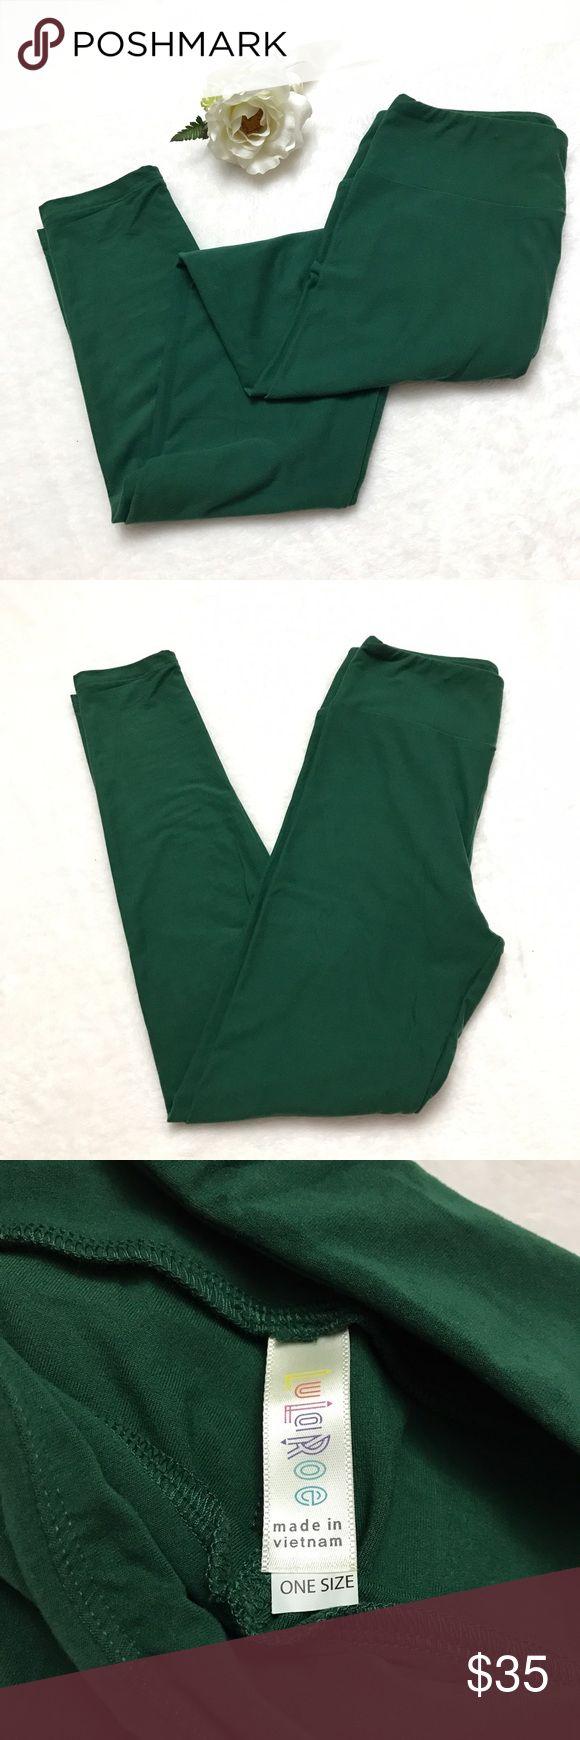 LULAROE Solid Forest Green Leggings LULAROE Solid Forest Green Leggings - worn once! Like new! LuLaRoe Pants Leggings